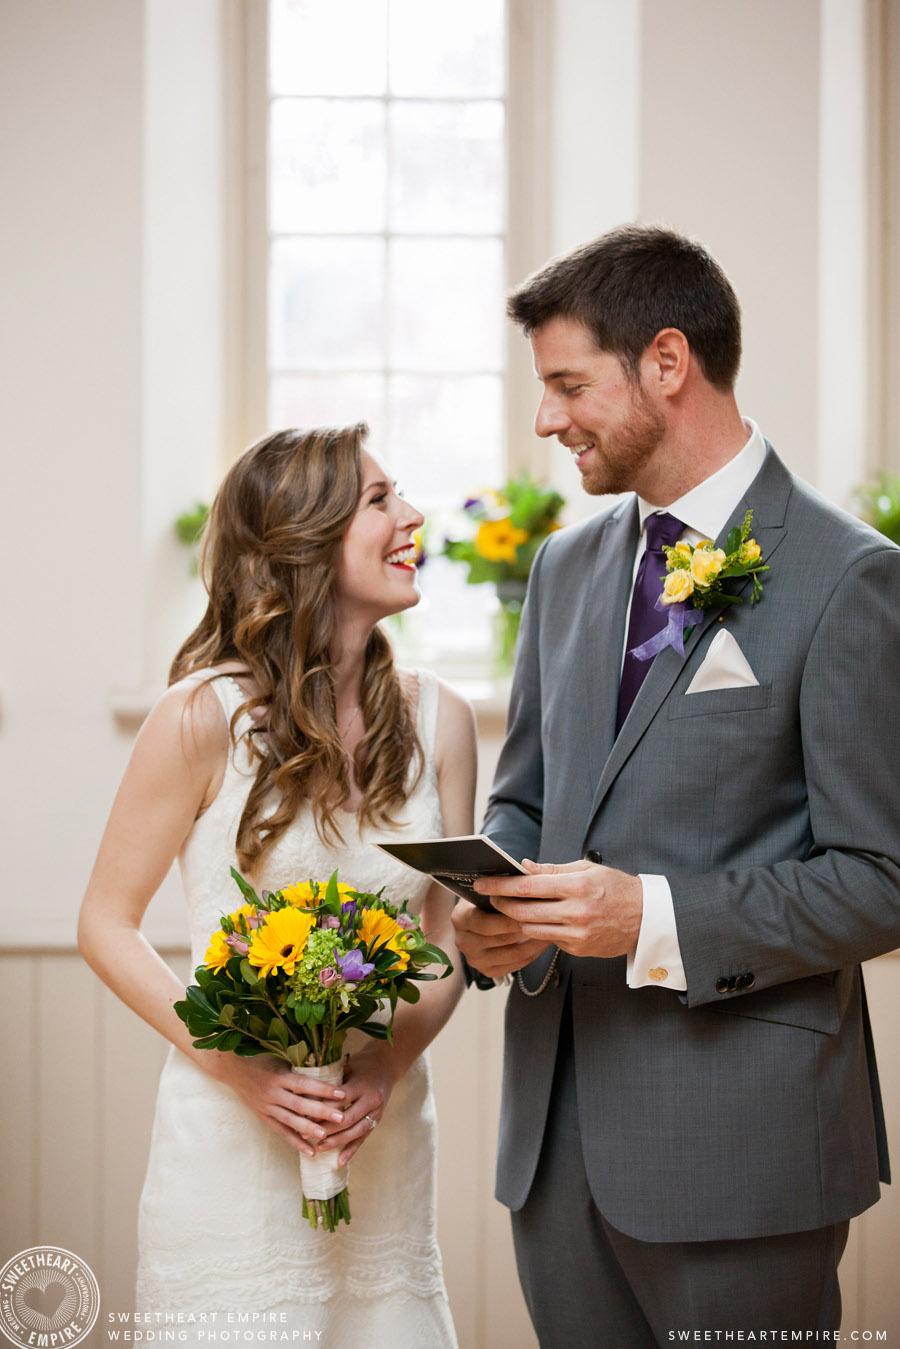 Musicians Wedding-Enoch Turner_48_s